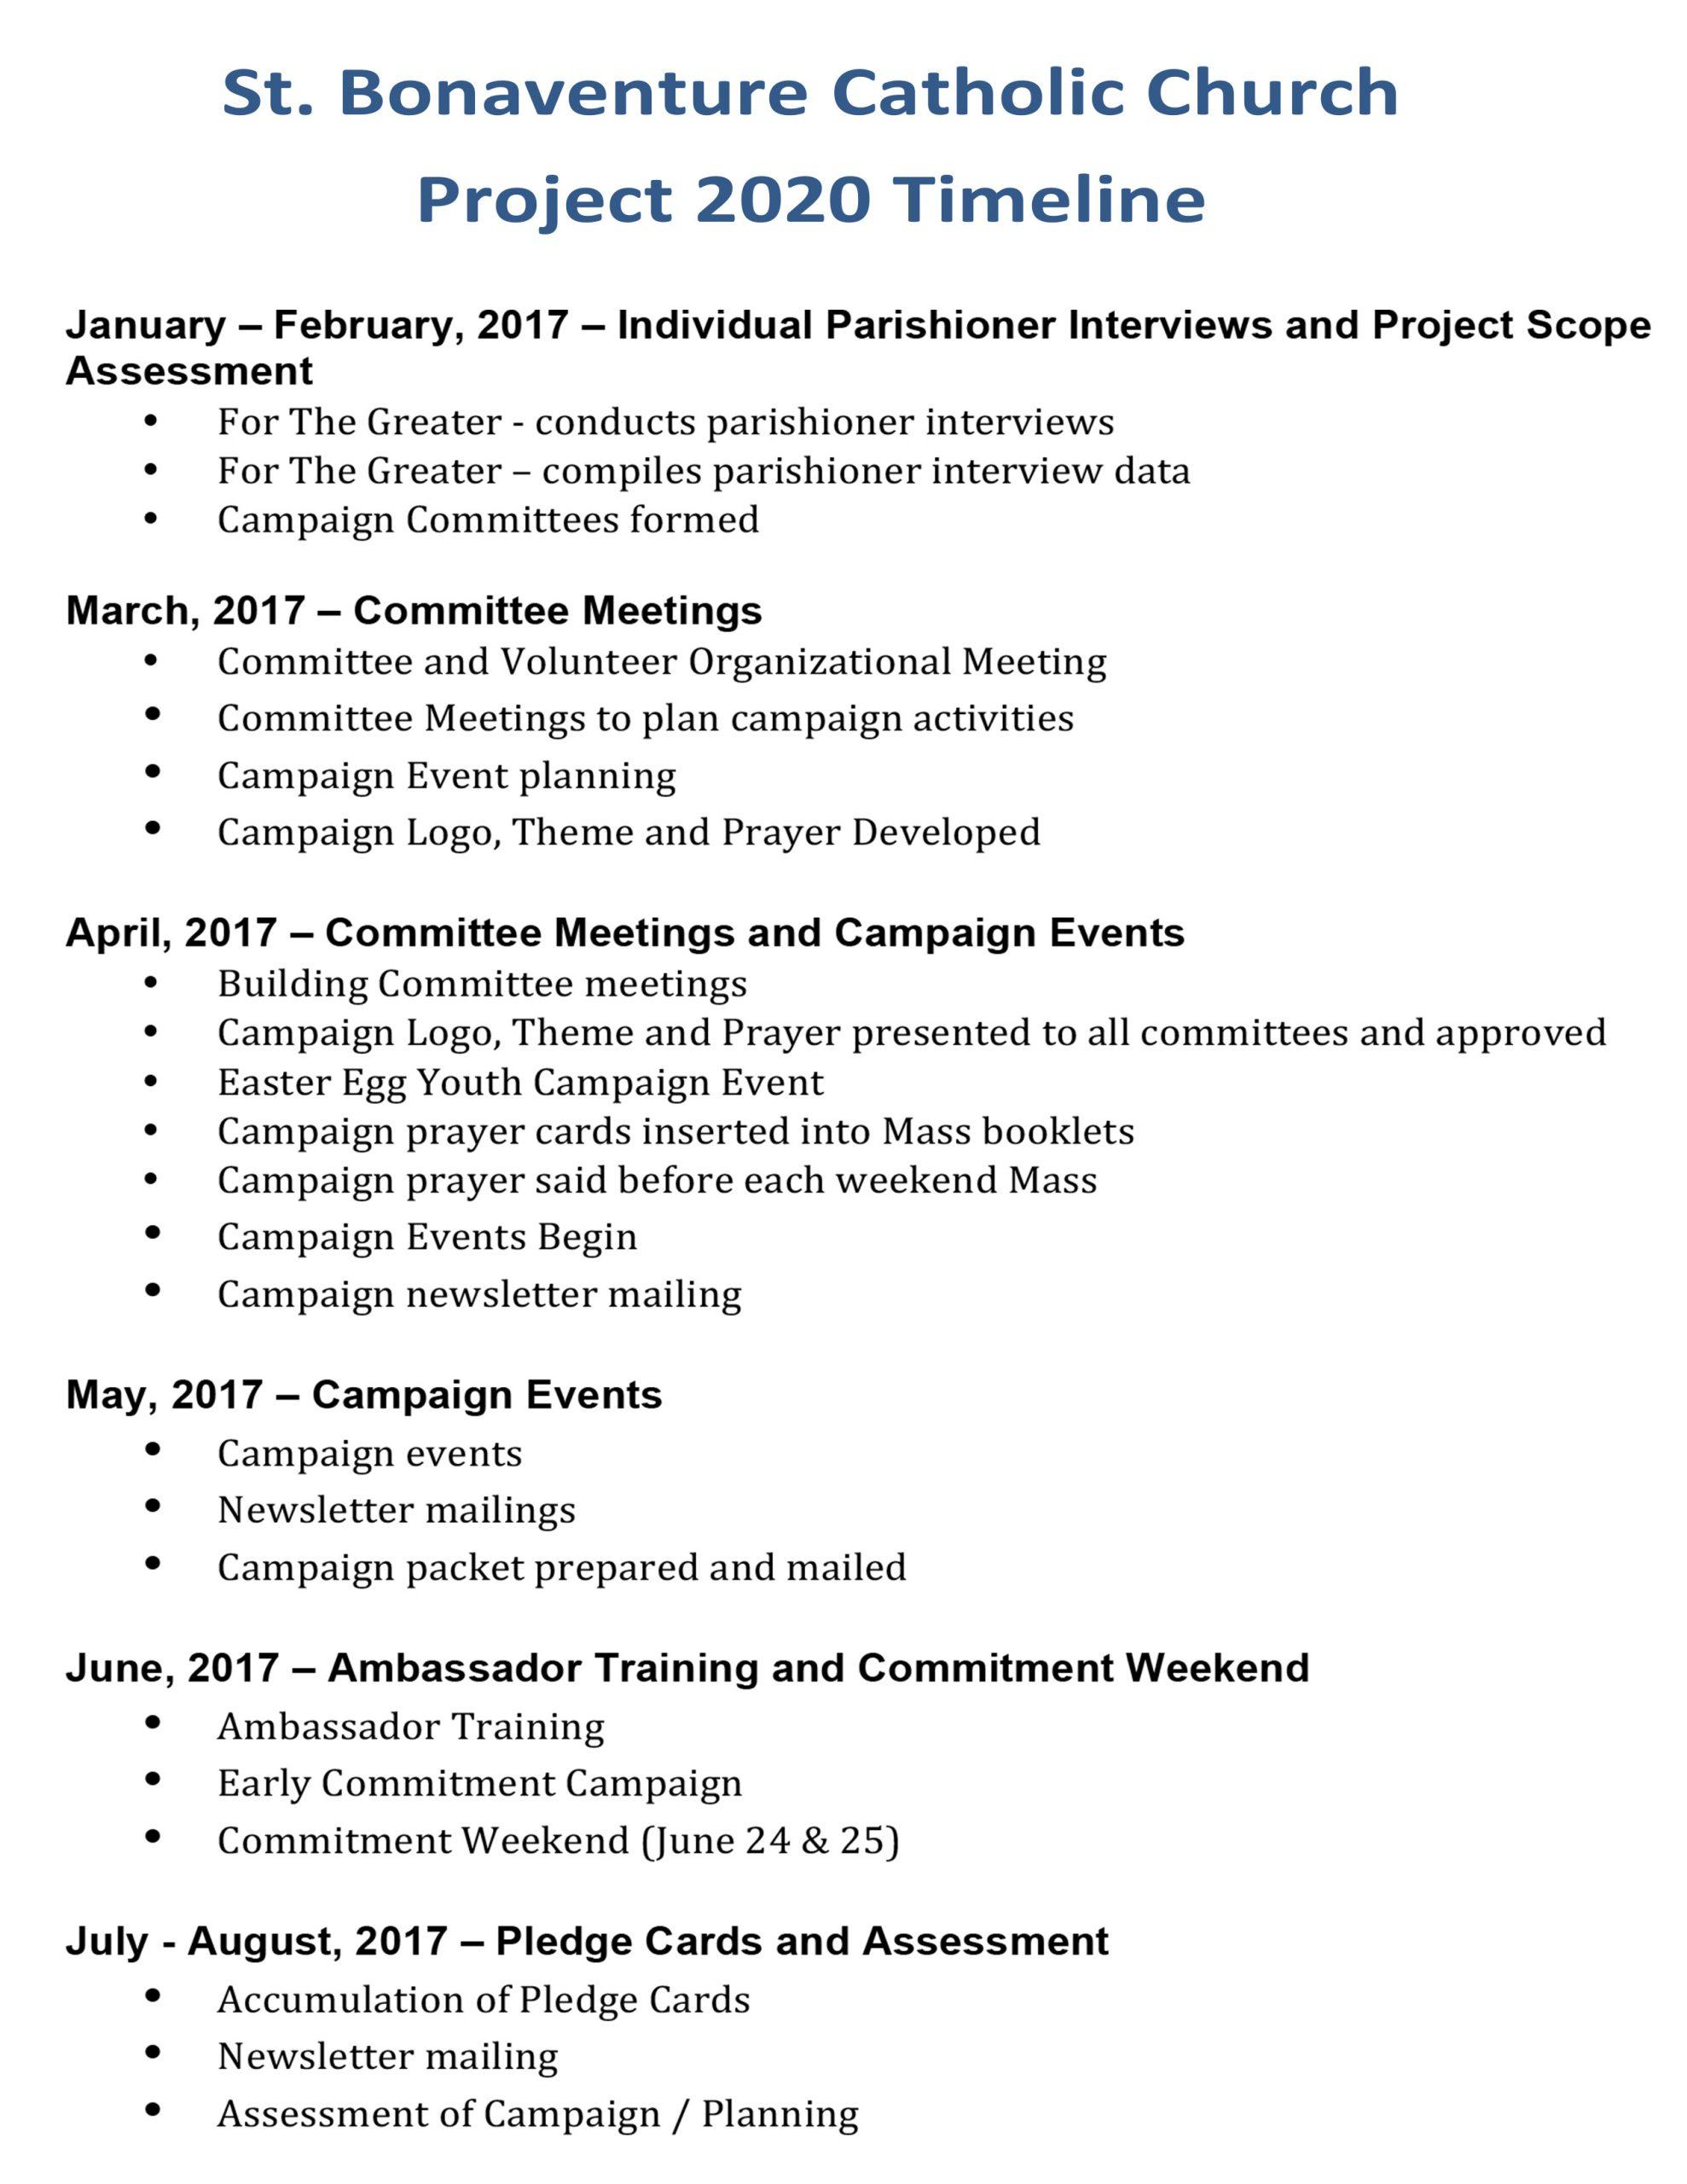 Microsoft Word - Project 2020 Timeline.docx - Saint